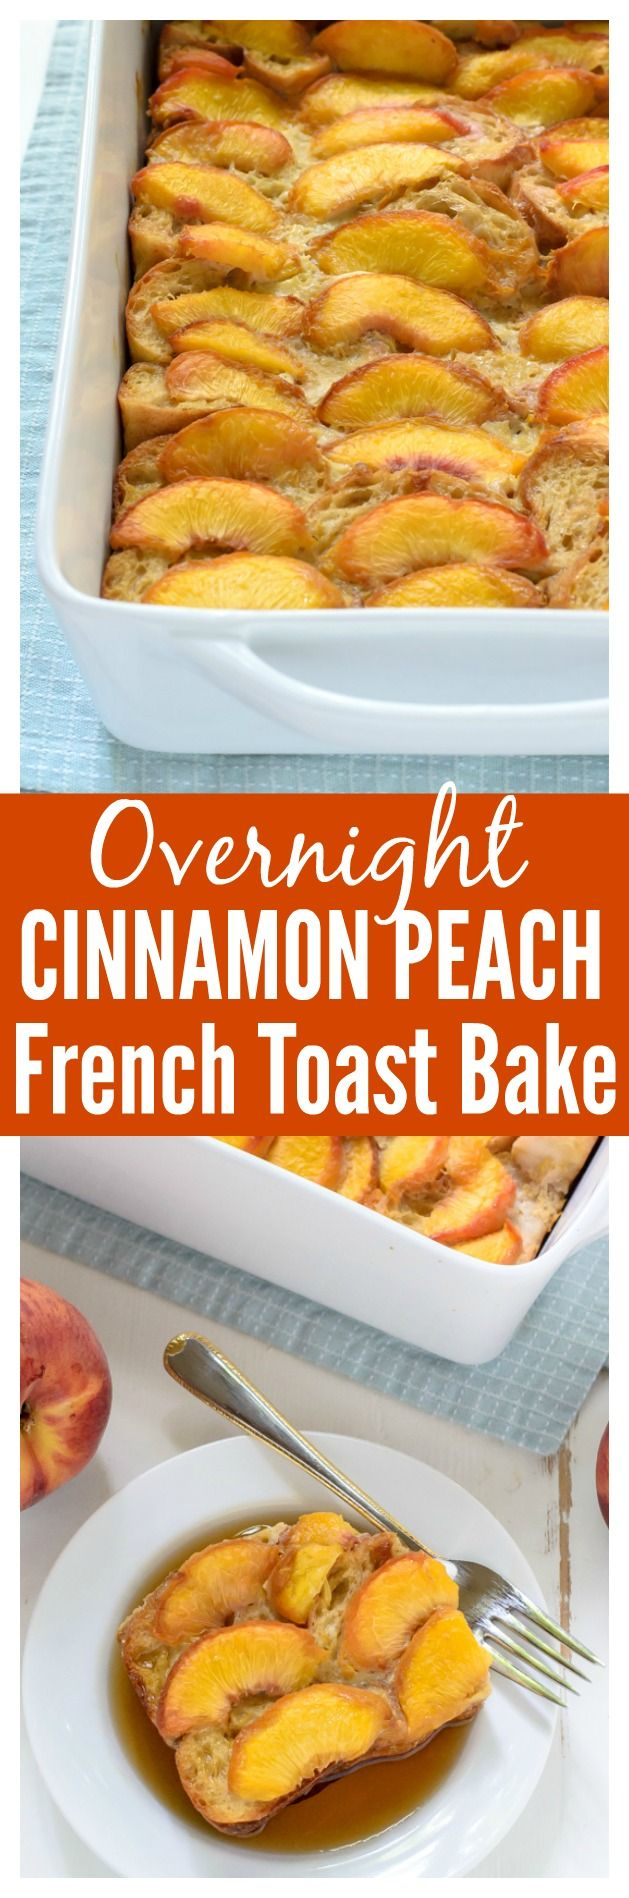 Overnight Cinnamon Peach French Toast Bake